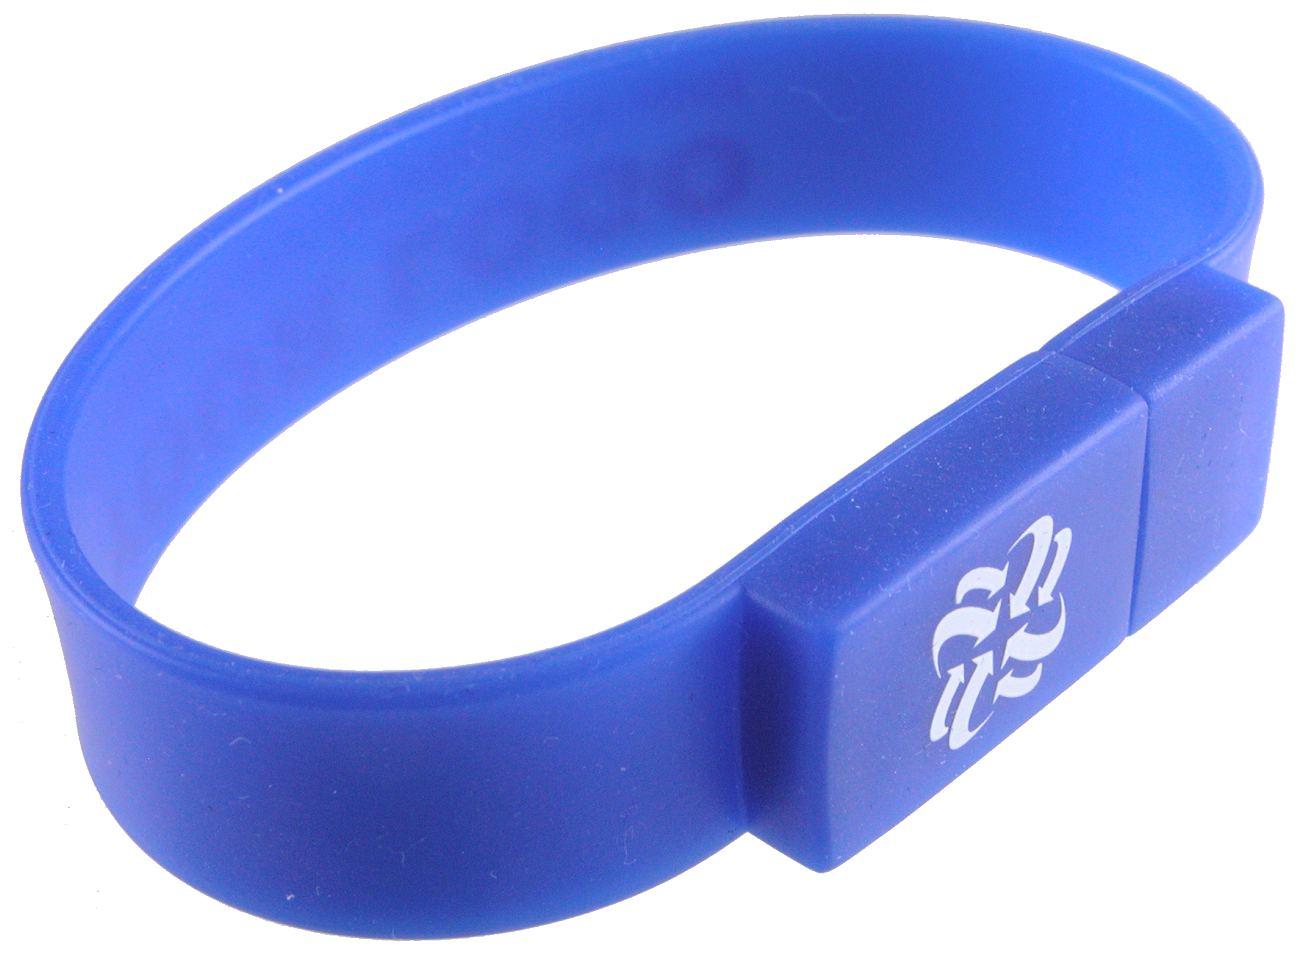 Usb Stick Wristband Blue Printed White Graphic Cd239